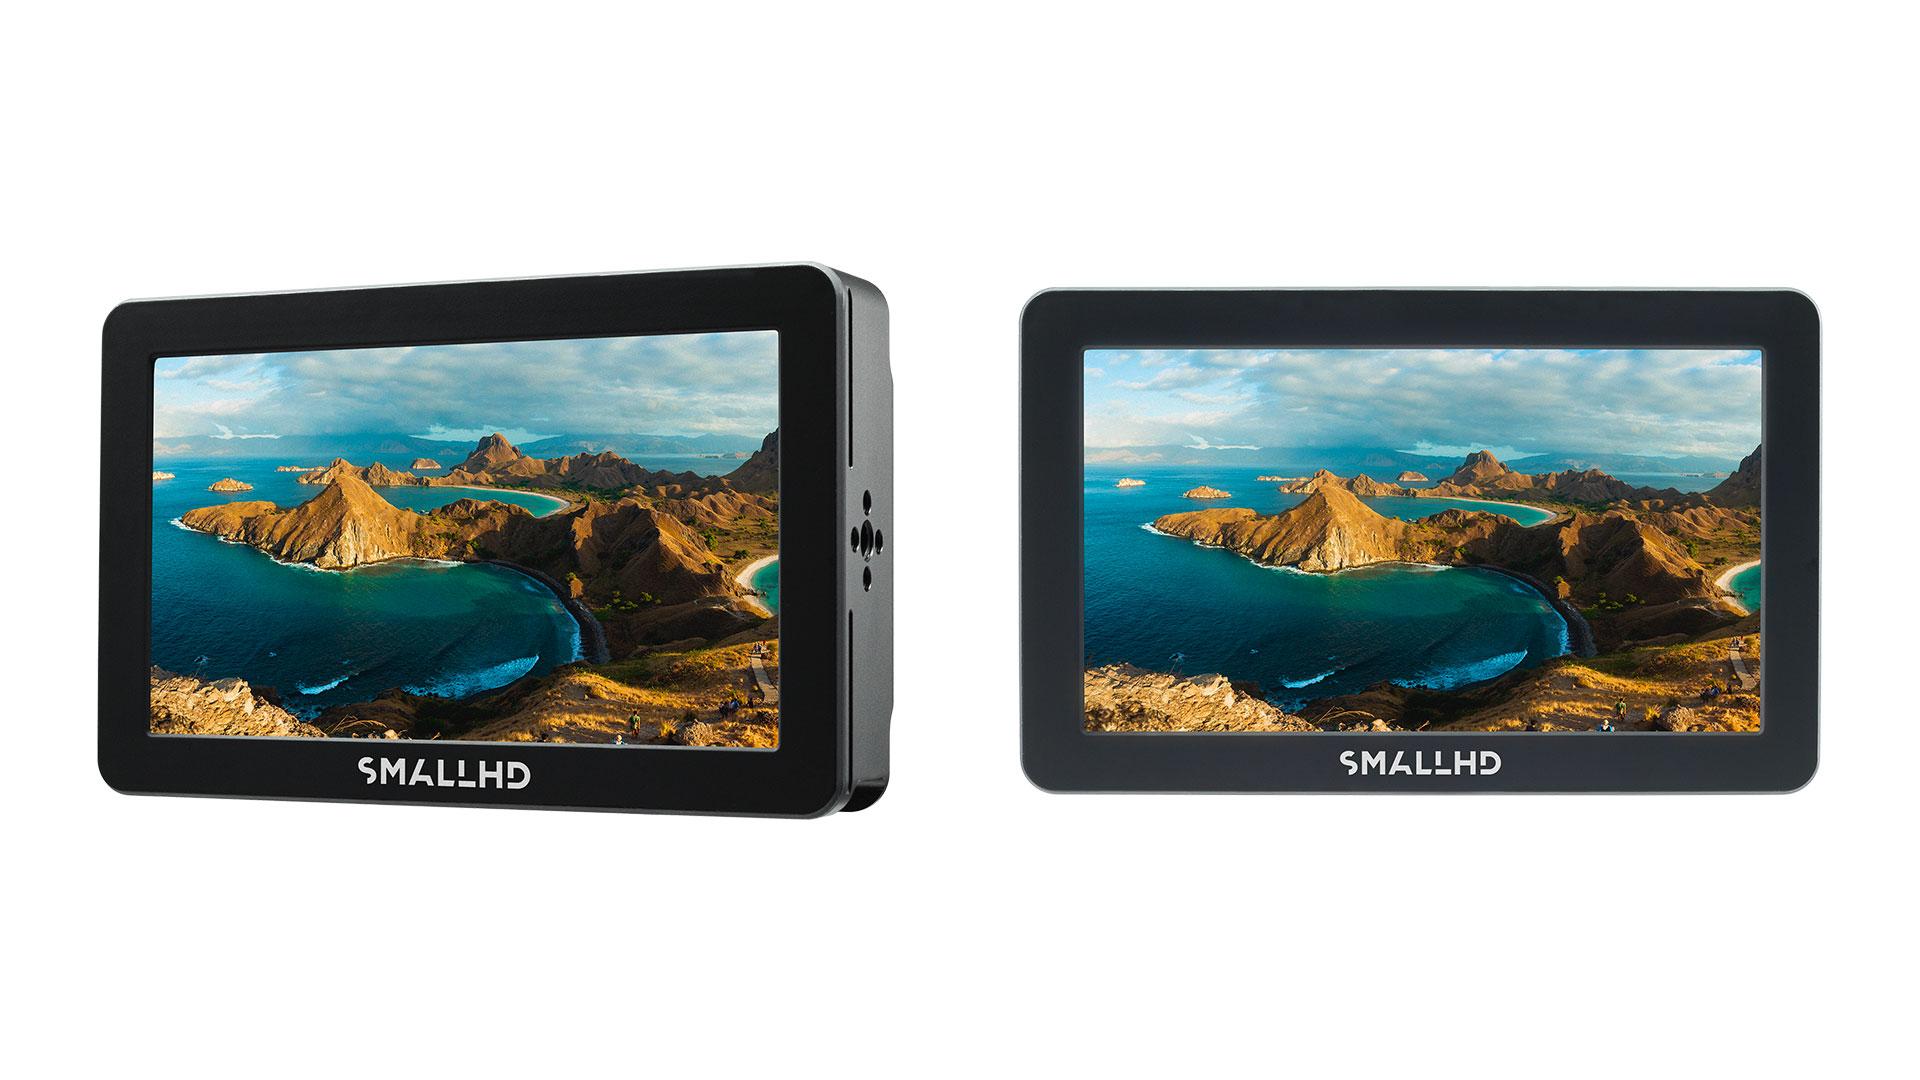 SmallHDがFocus Pro 5″モニターを発表 - REDカメラに対応